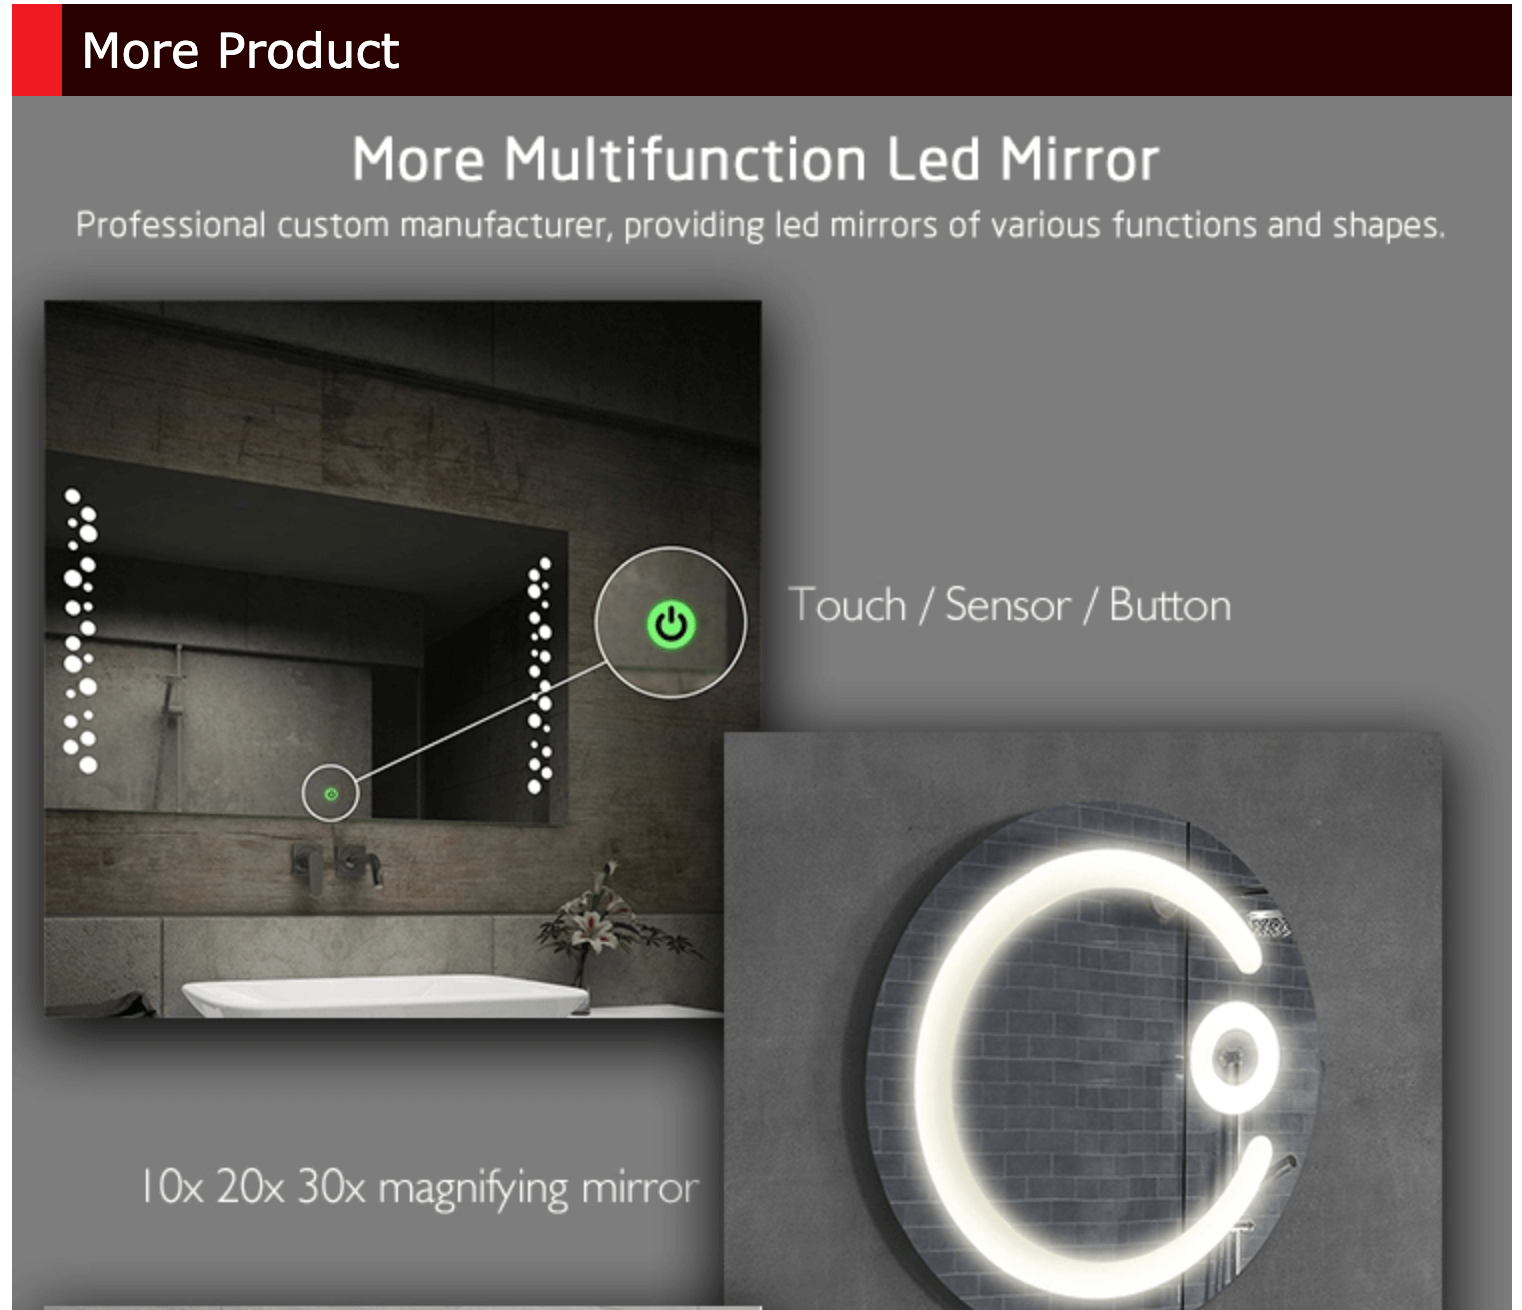 Makeup Mirror Manufacturer PRODUCT DETAILS